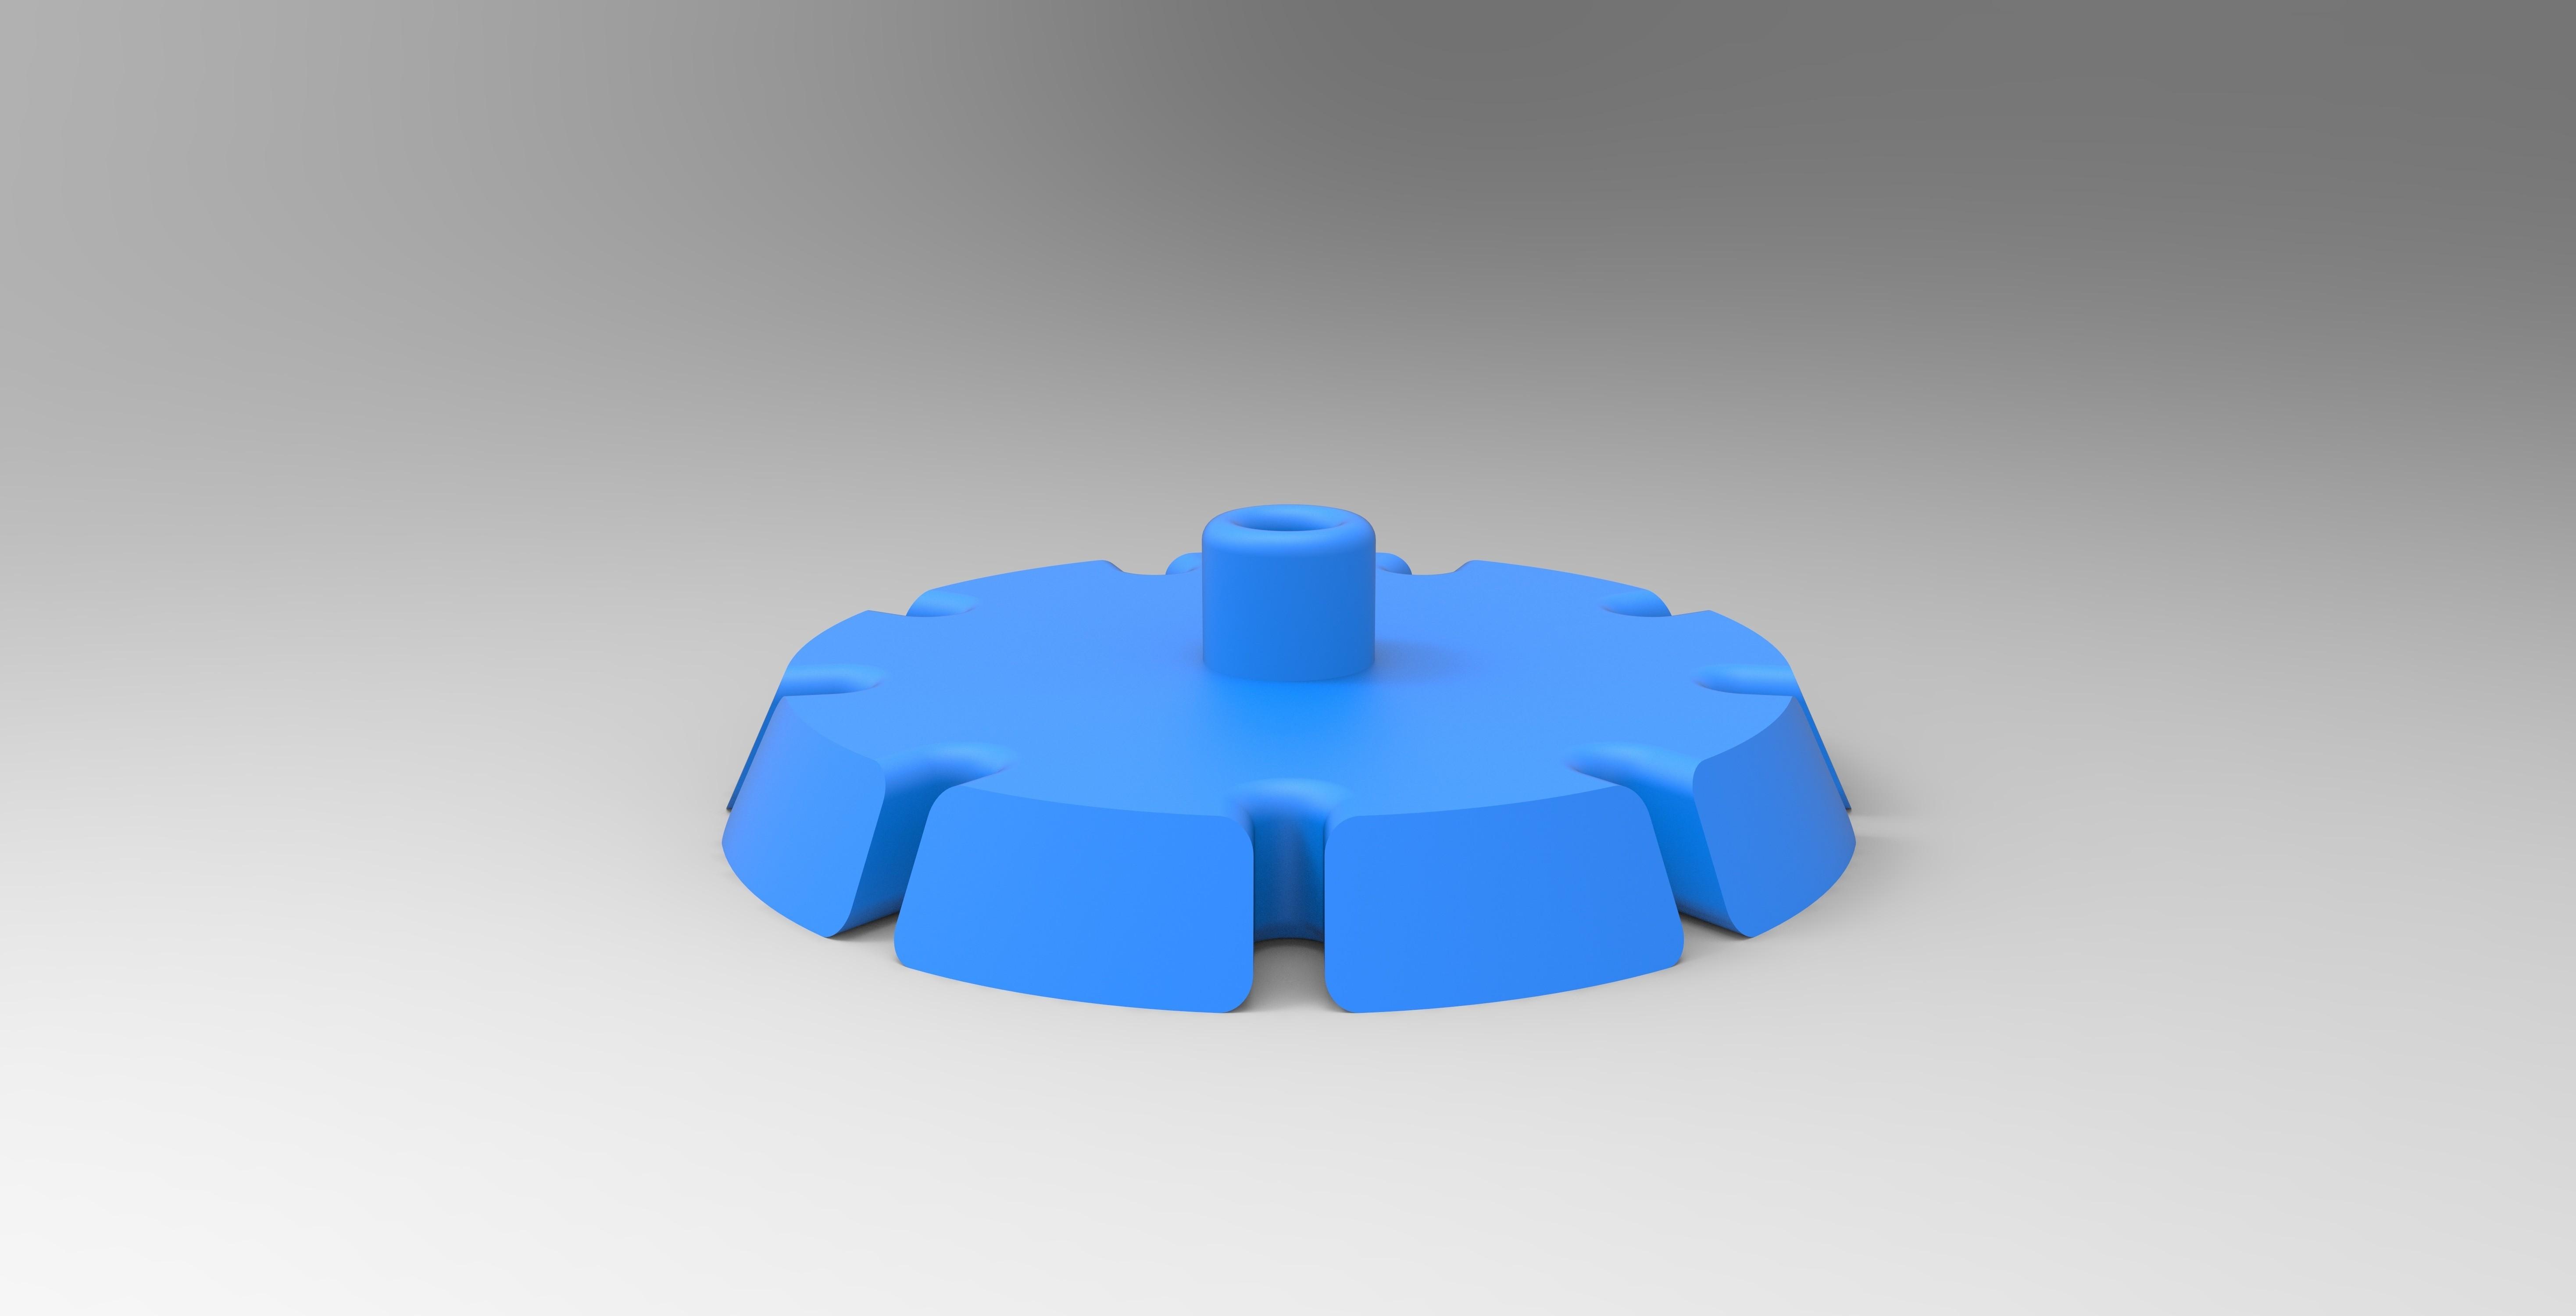 fgh.jpg Download STL file HELP CUTTING CAKE PART CUTTING • 3D printer object, GuilhemPerroud